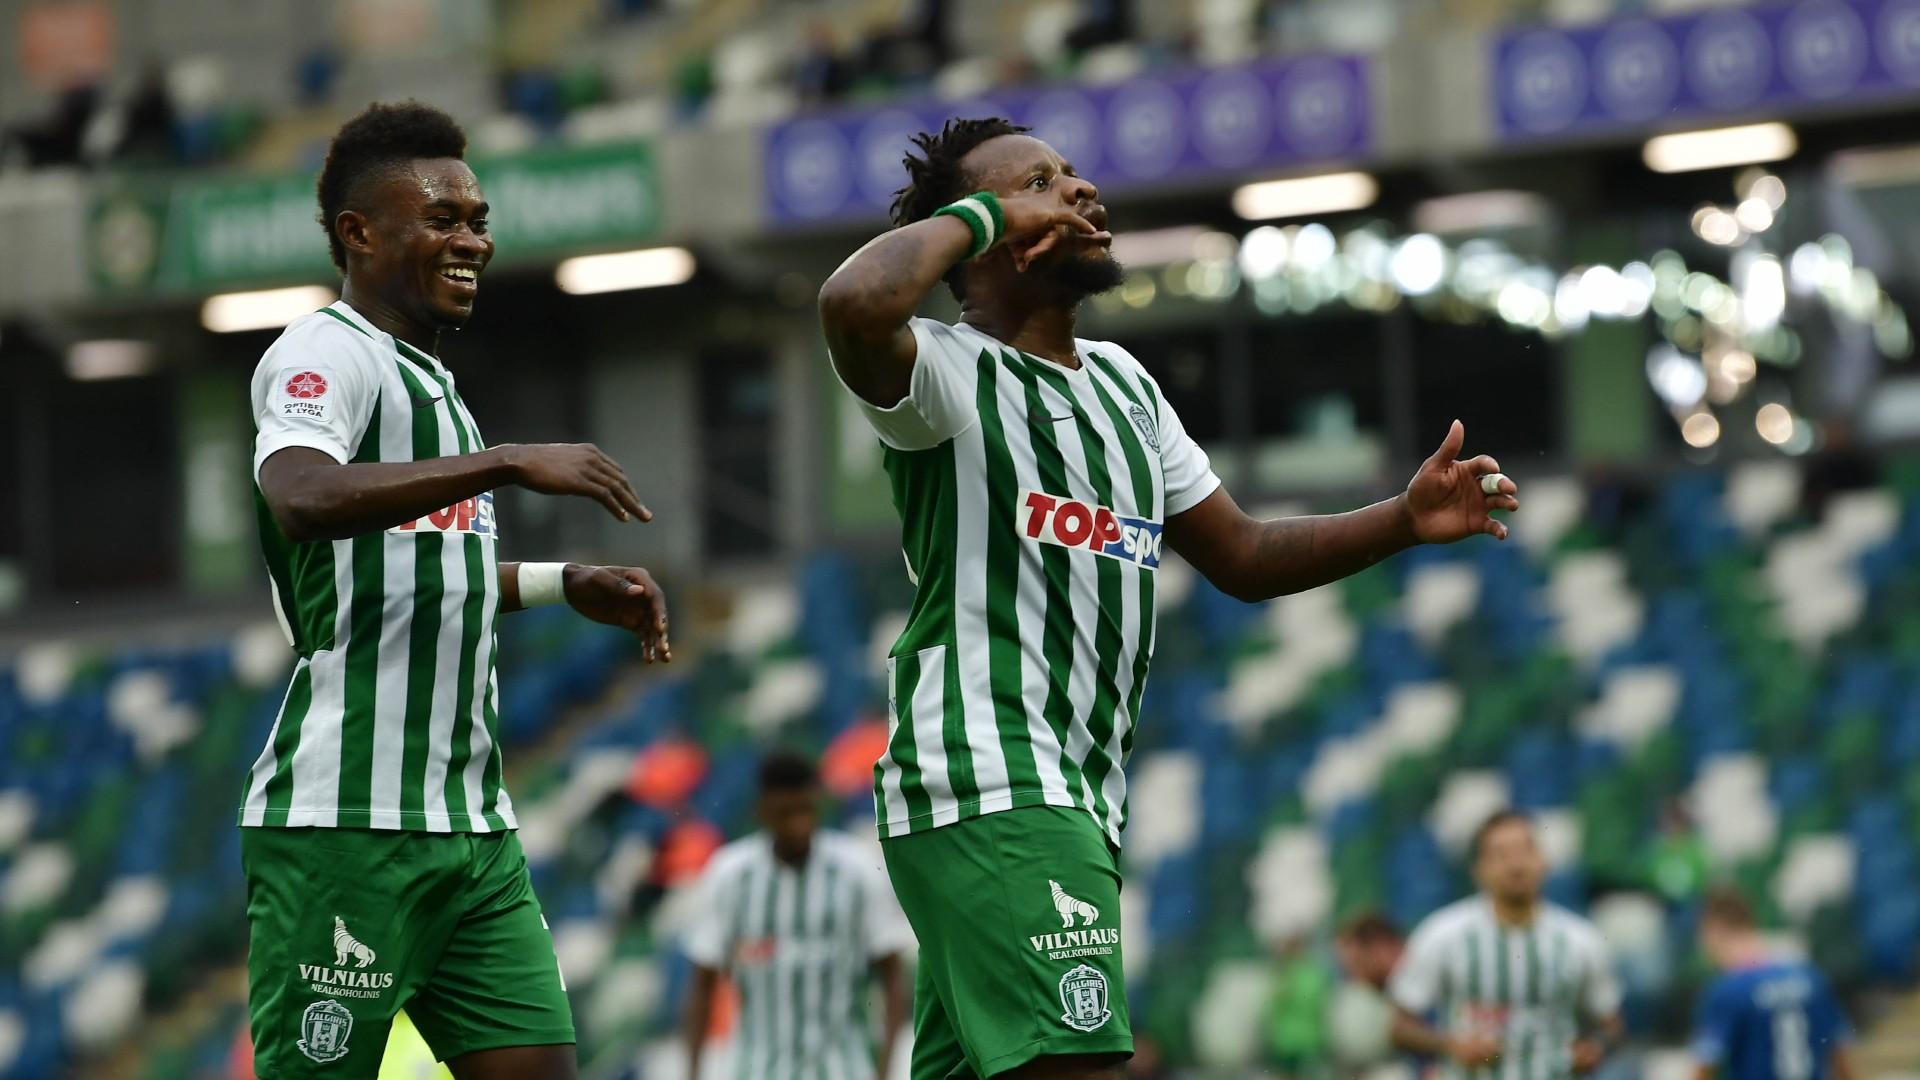 Europa League: Onazi's Zalgiris crash out as Diagne & Feghouli fire Galatasaray to next round